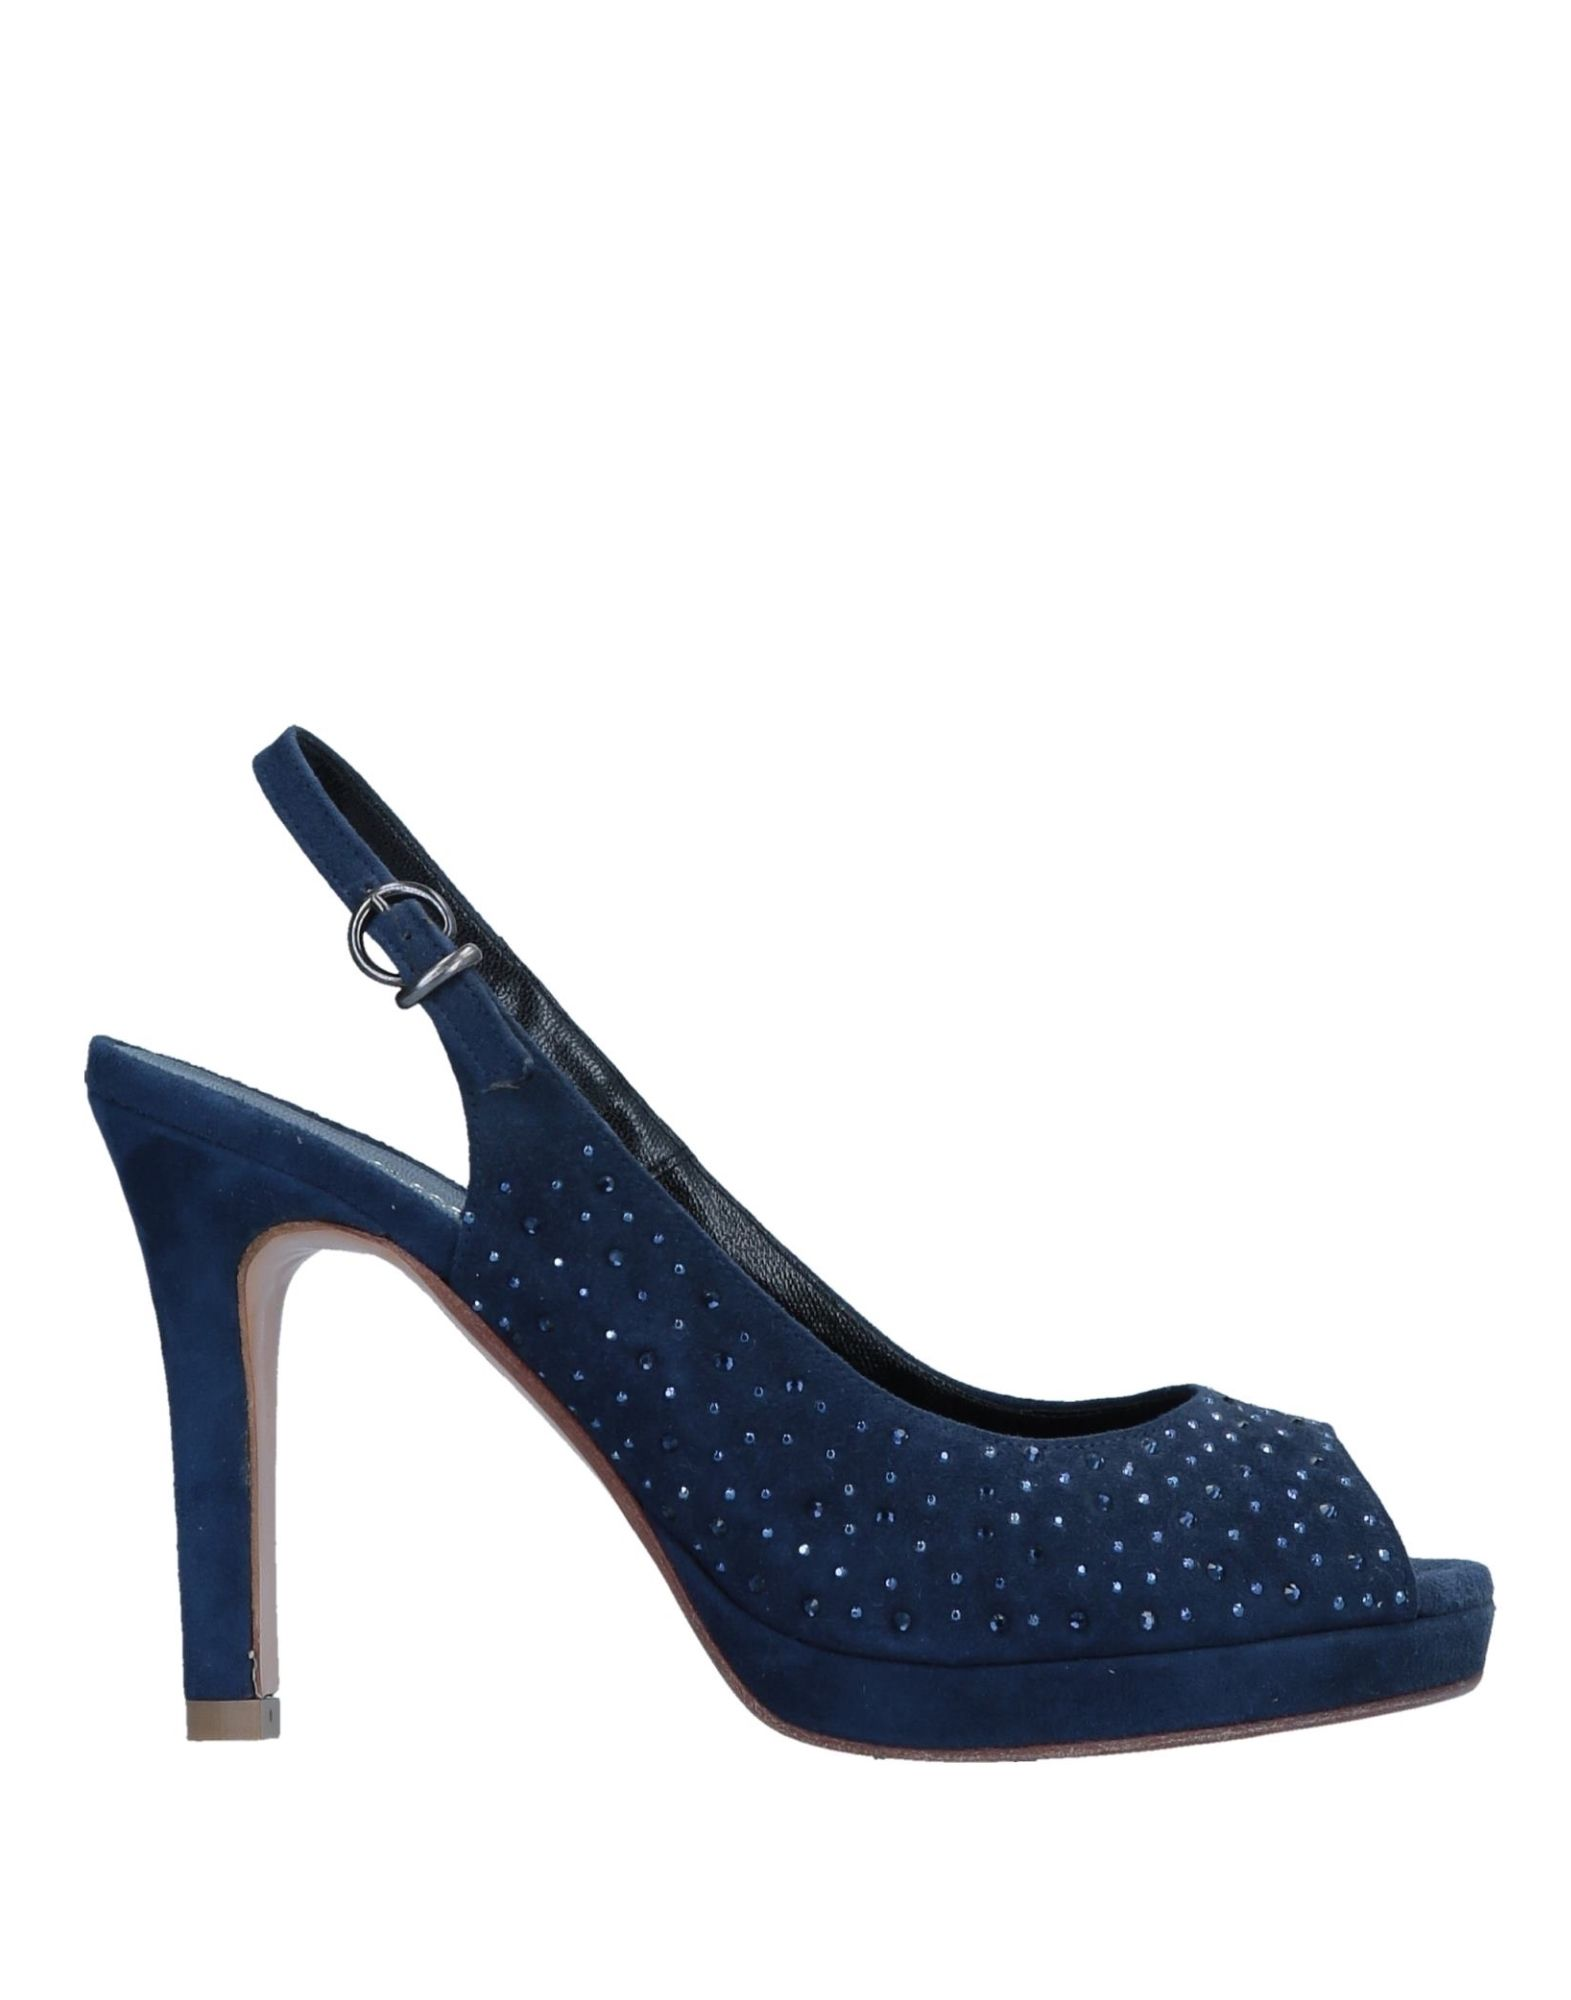 Gut tragenLes um billige Schuhe zu tragenLes Gut Poemes Pumps Damen  11504884WX 0509a0